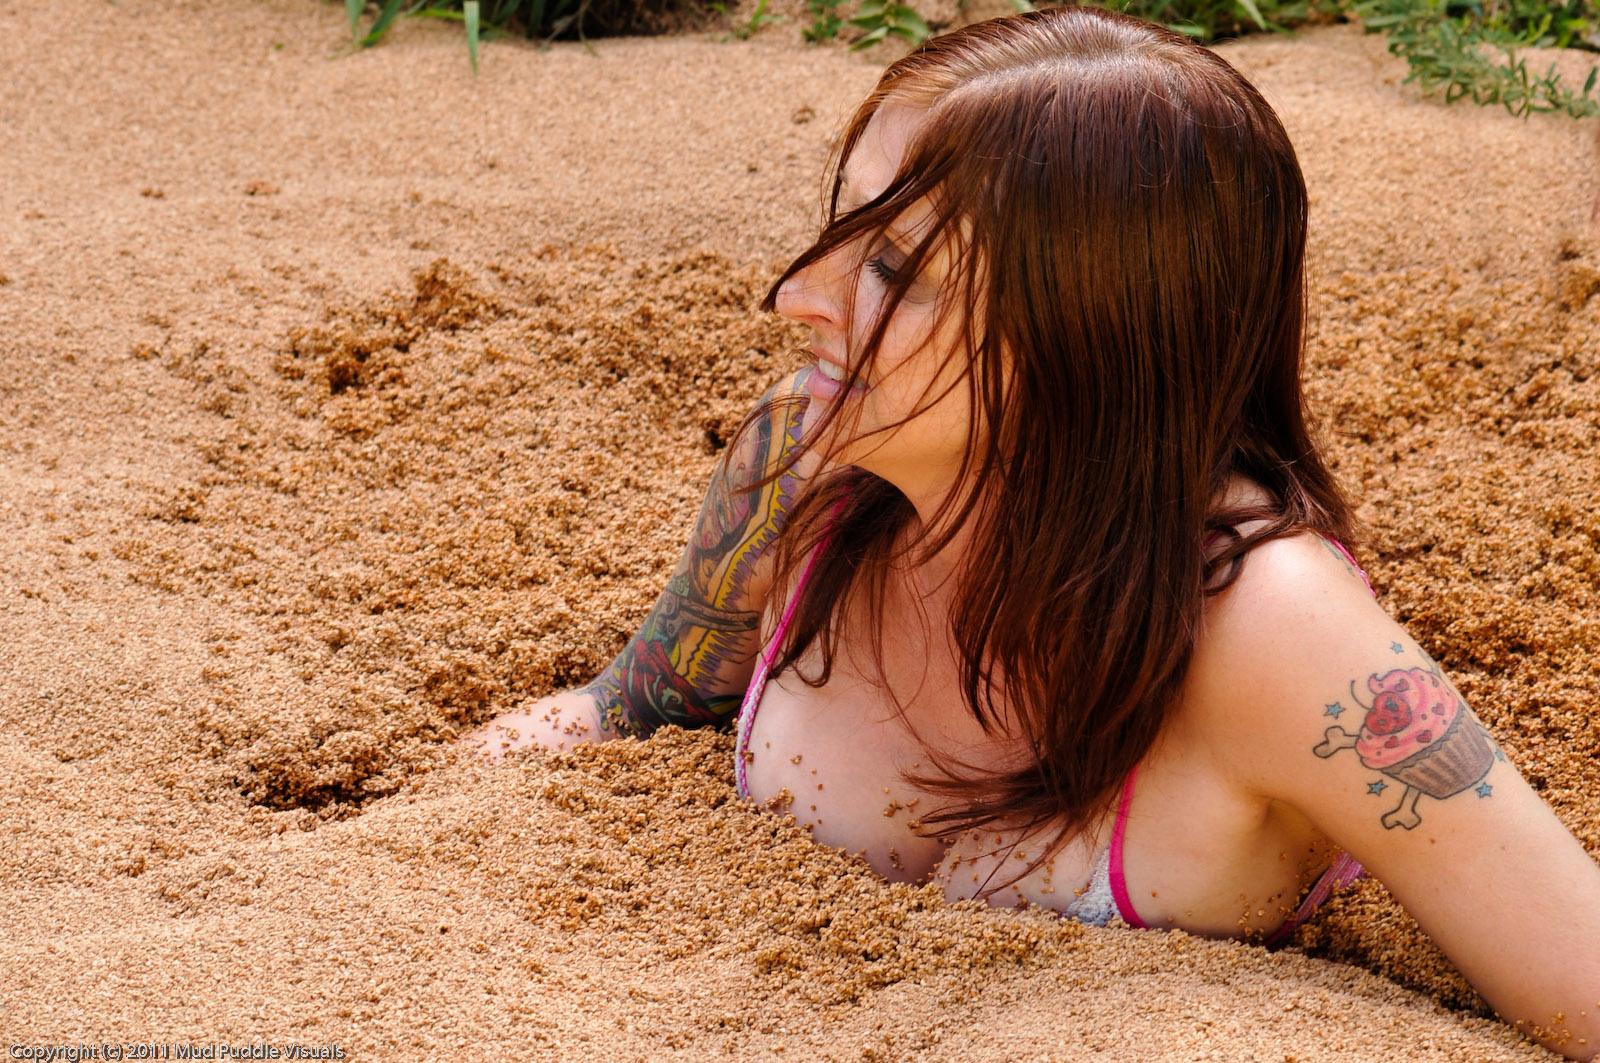 Paris Kennedy quicksand Paris-in-hollywood-quicksand_5